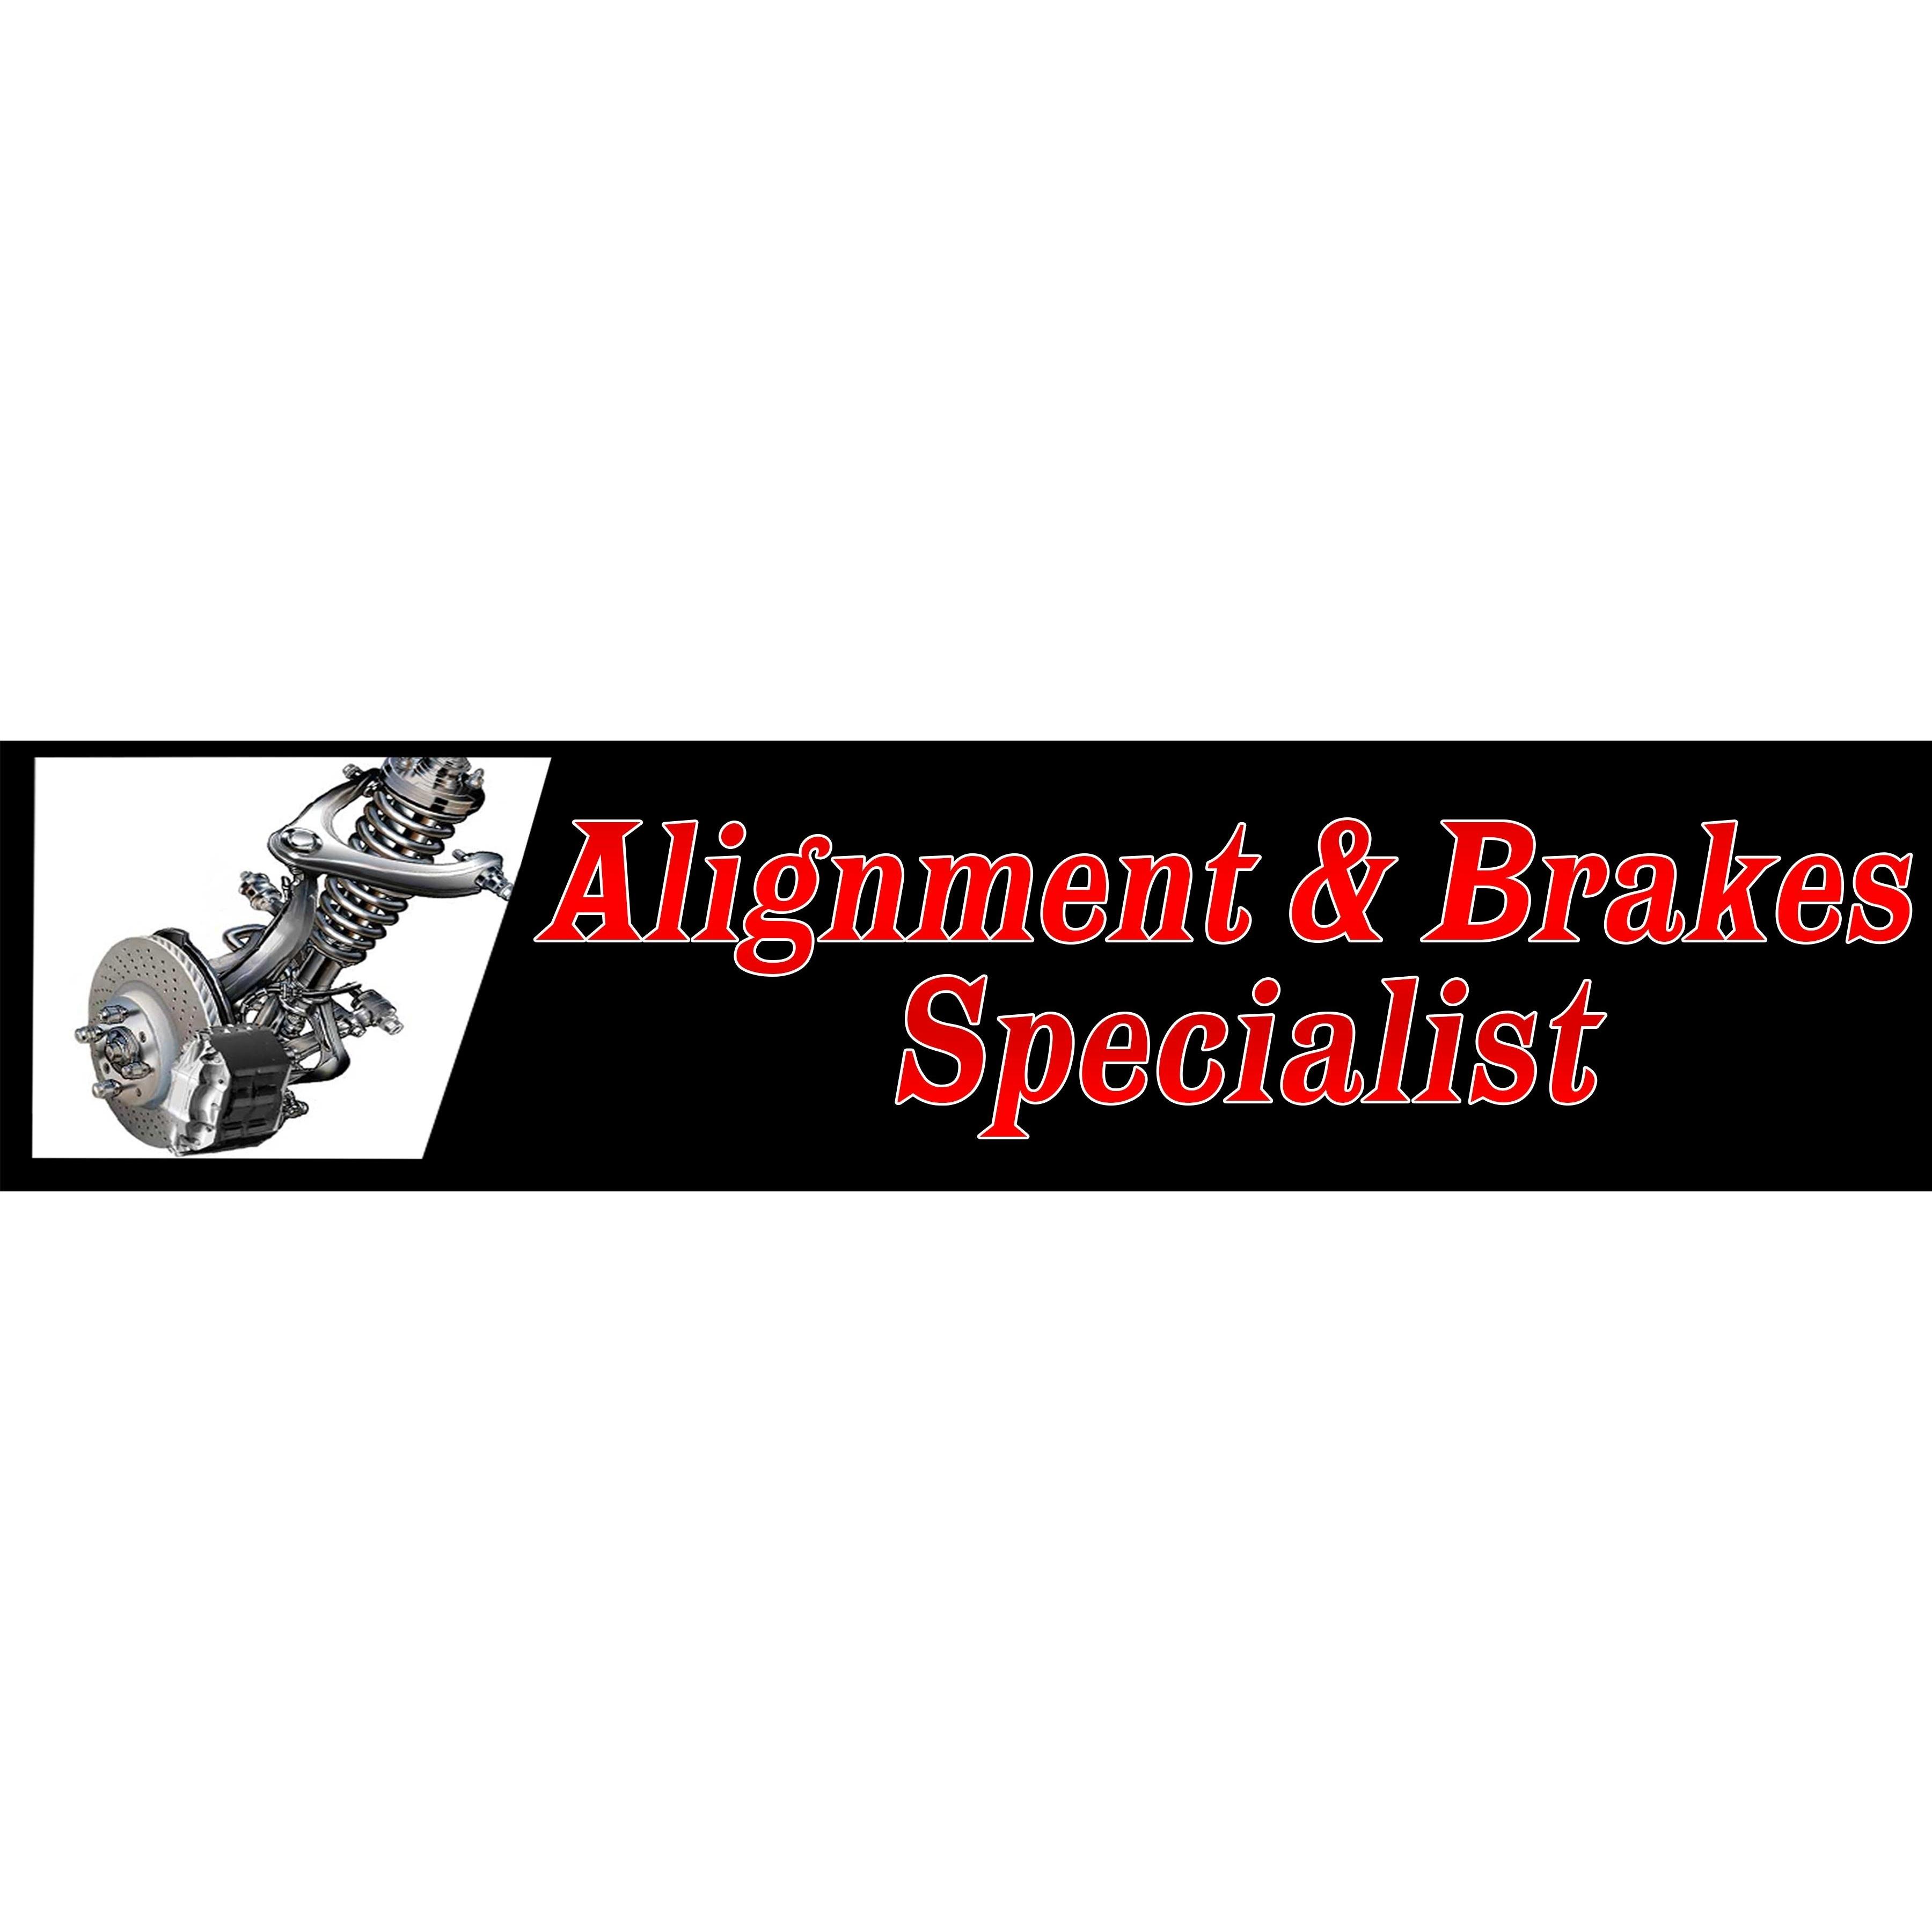 Alignment & Brakes Specialist